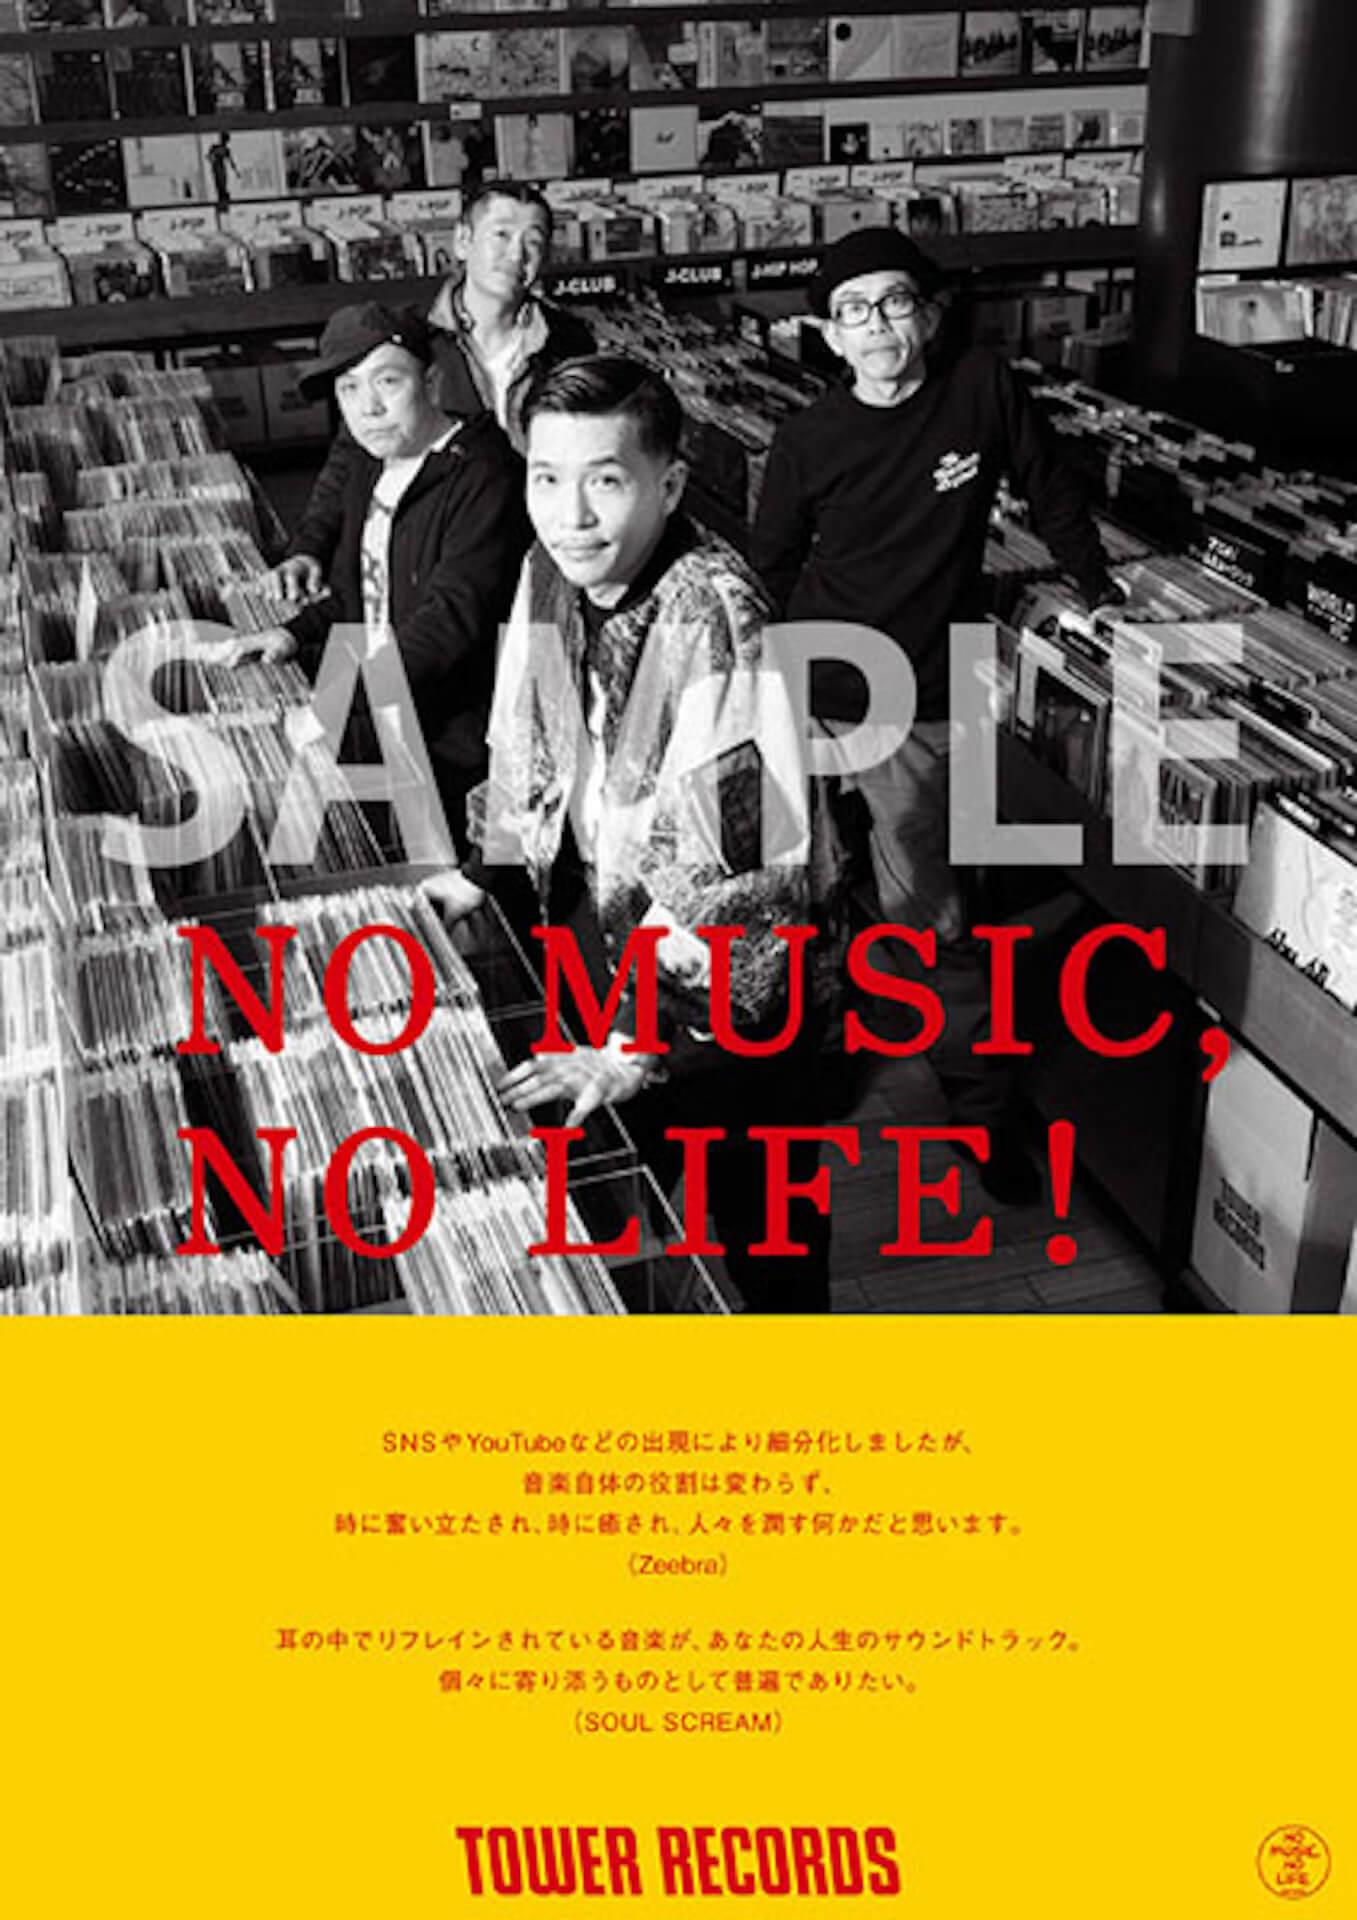 「NO MUSIC,NO LIFE.」ポスターに日本語ラップレジェンドのスチャダラパー×ライムスター、Zeebra×SOUL SCREAMが登場! music200406_nomusicnolife_08